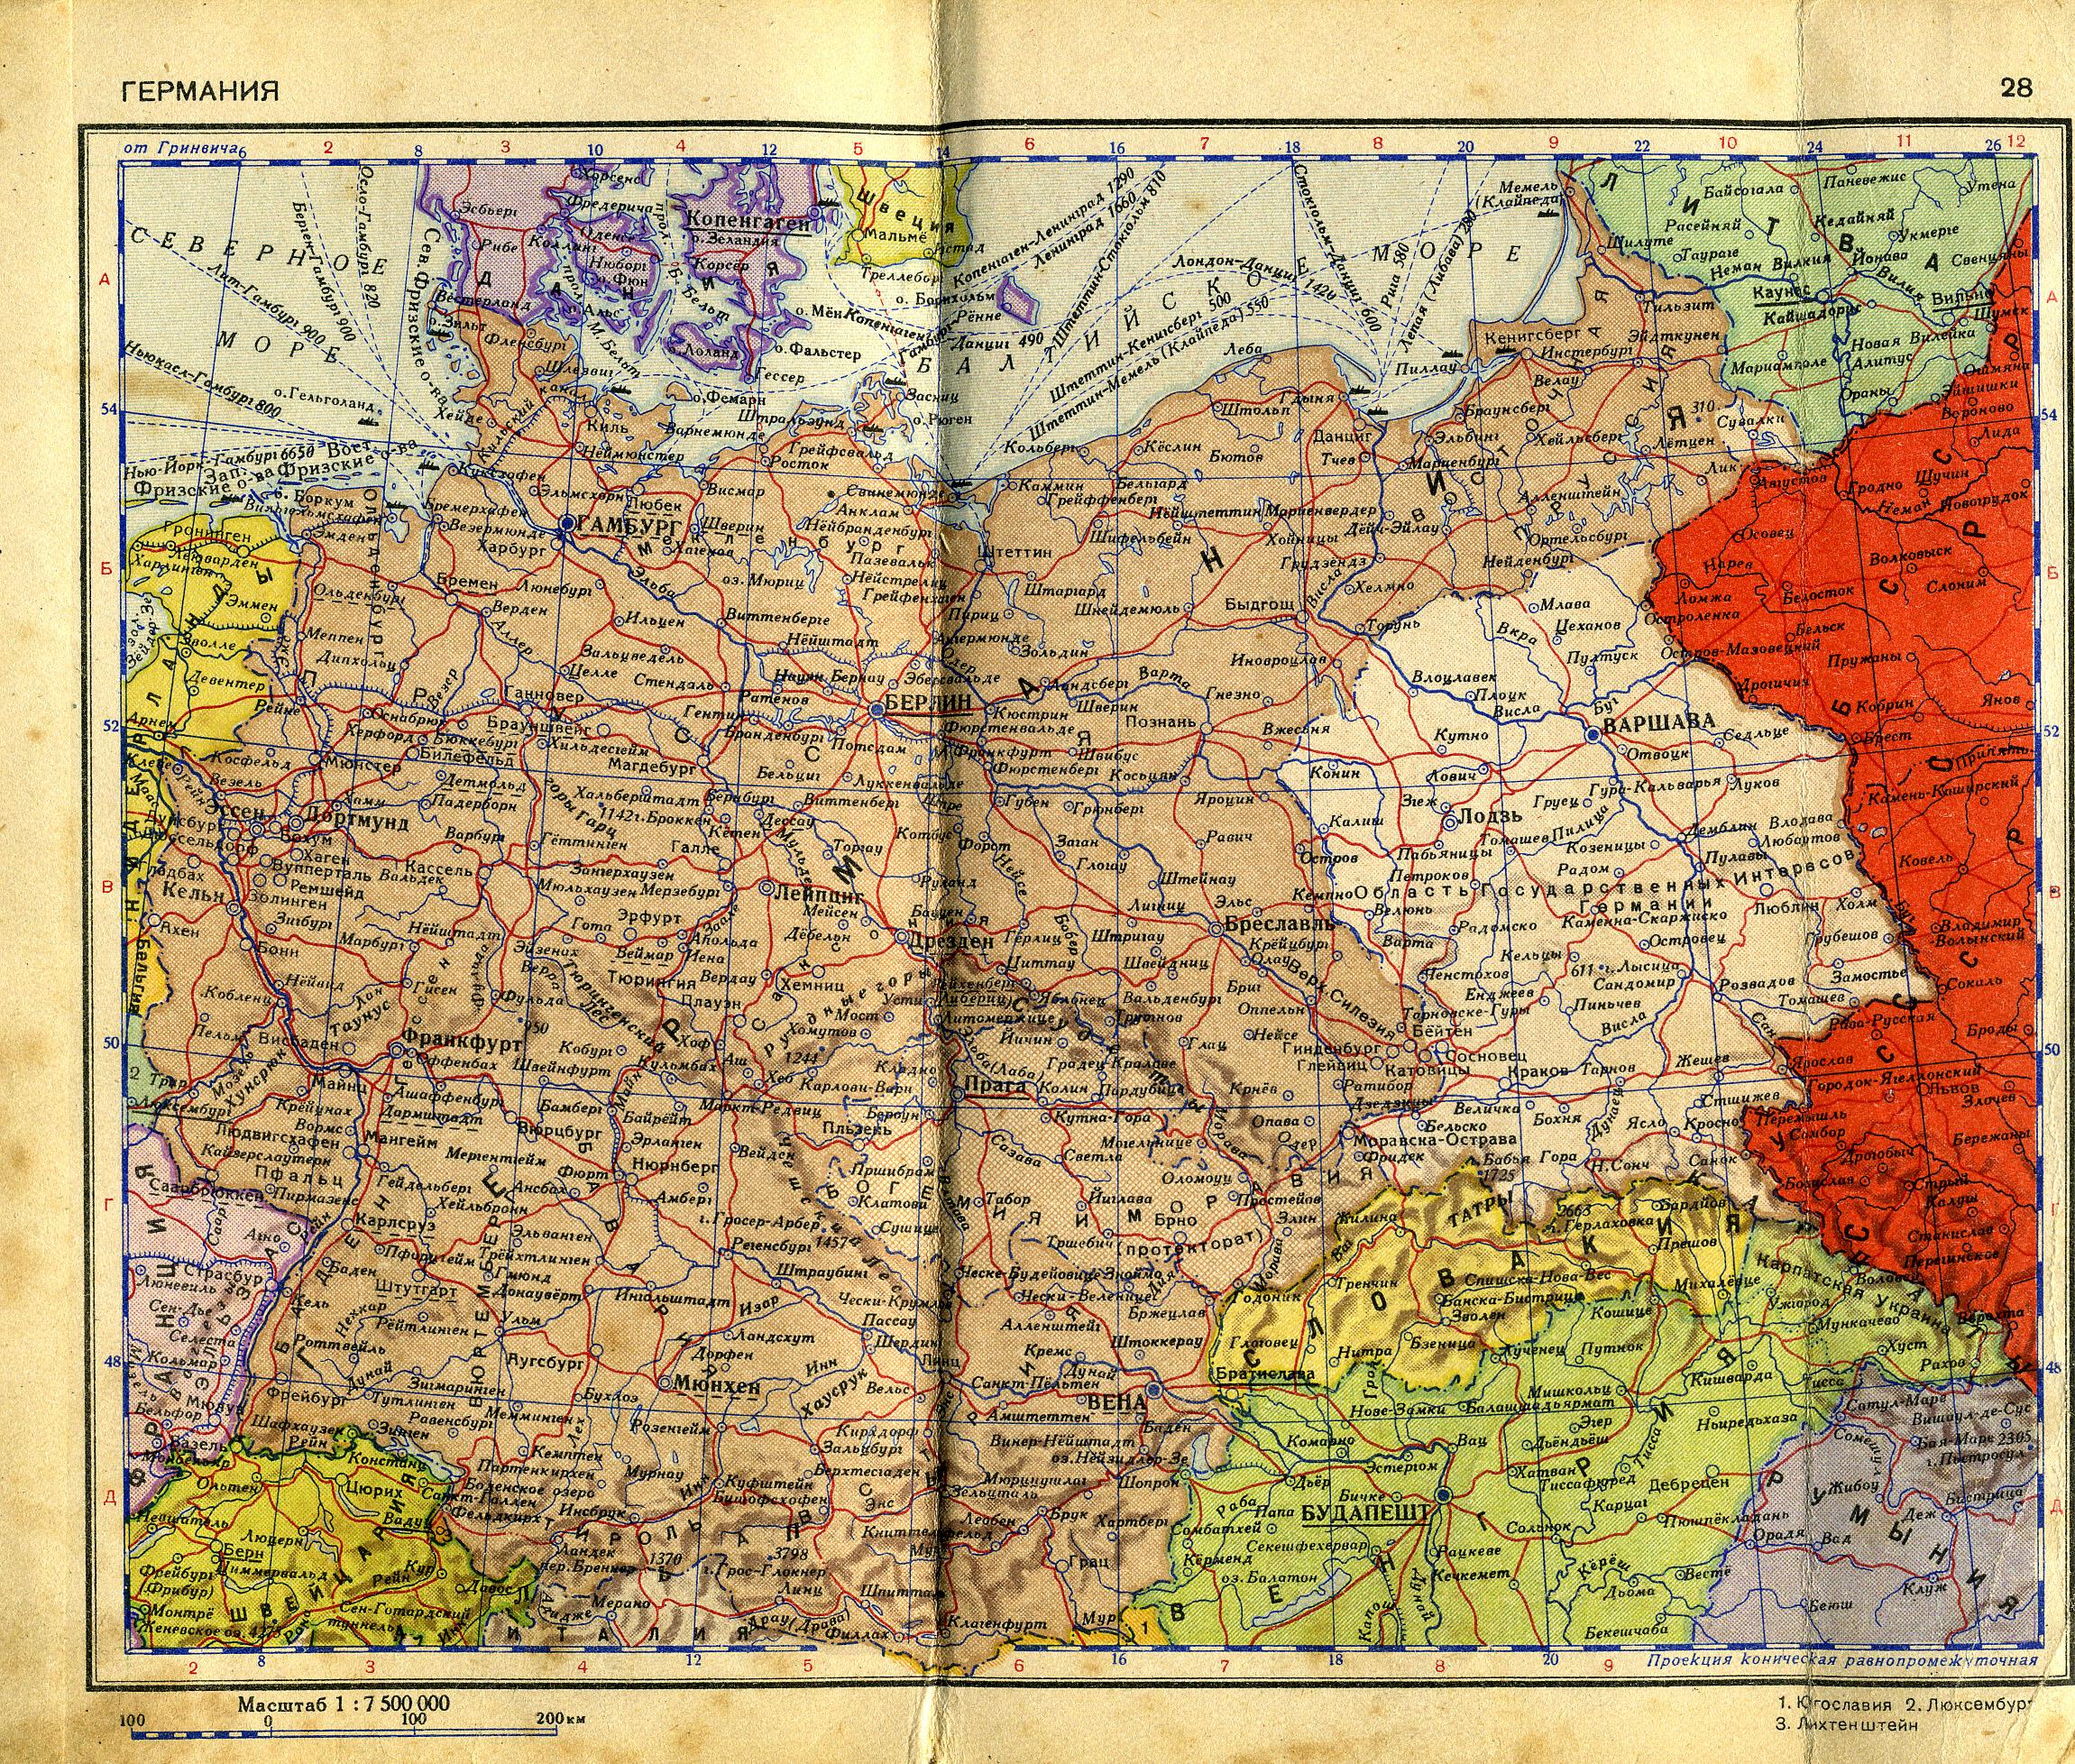 File Nazi Germany Jpg Wikimedia Commons - Germany map 1940